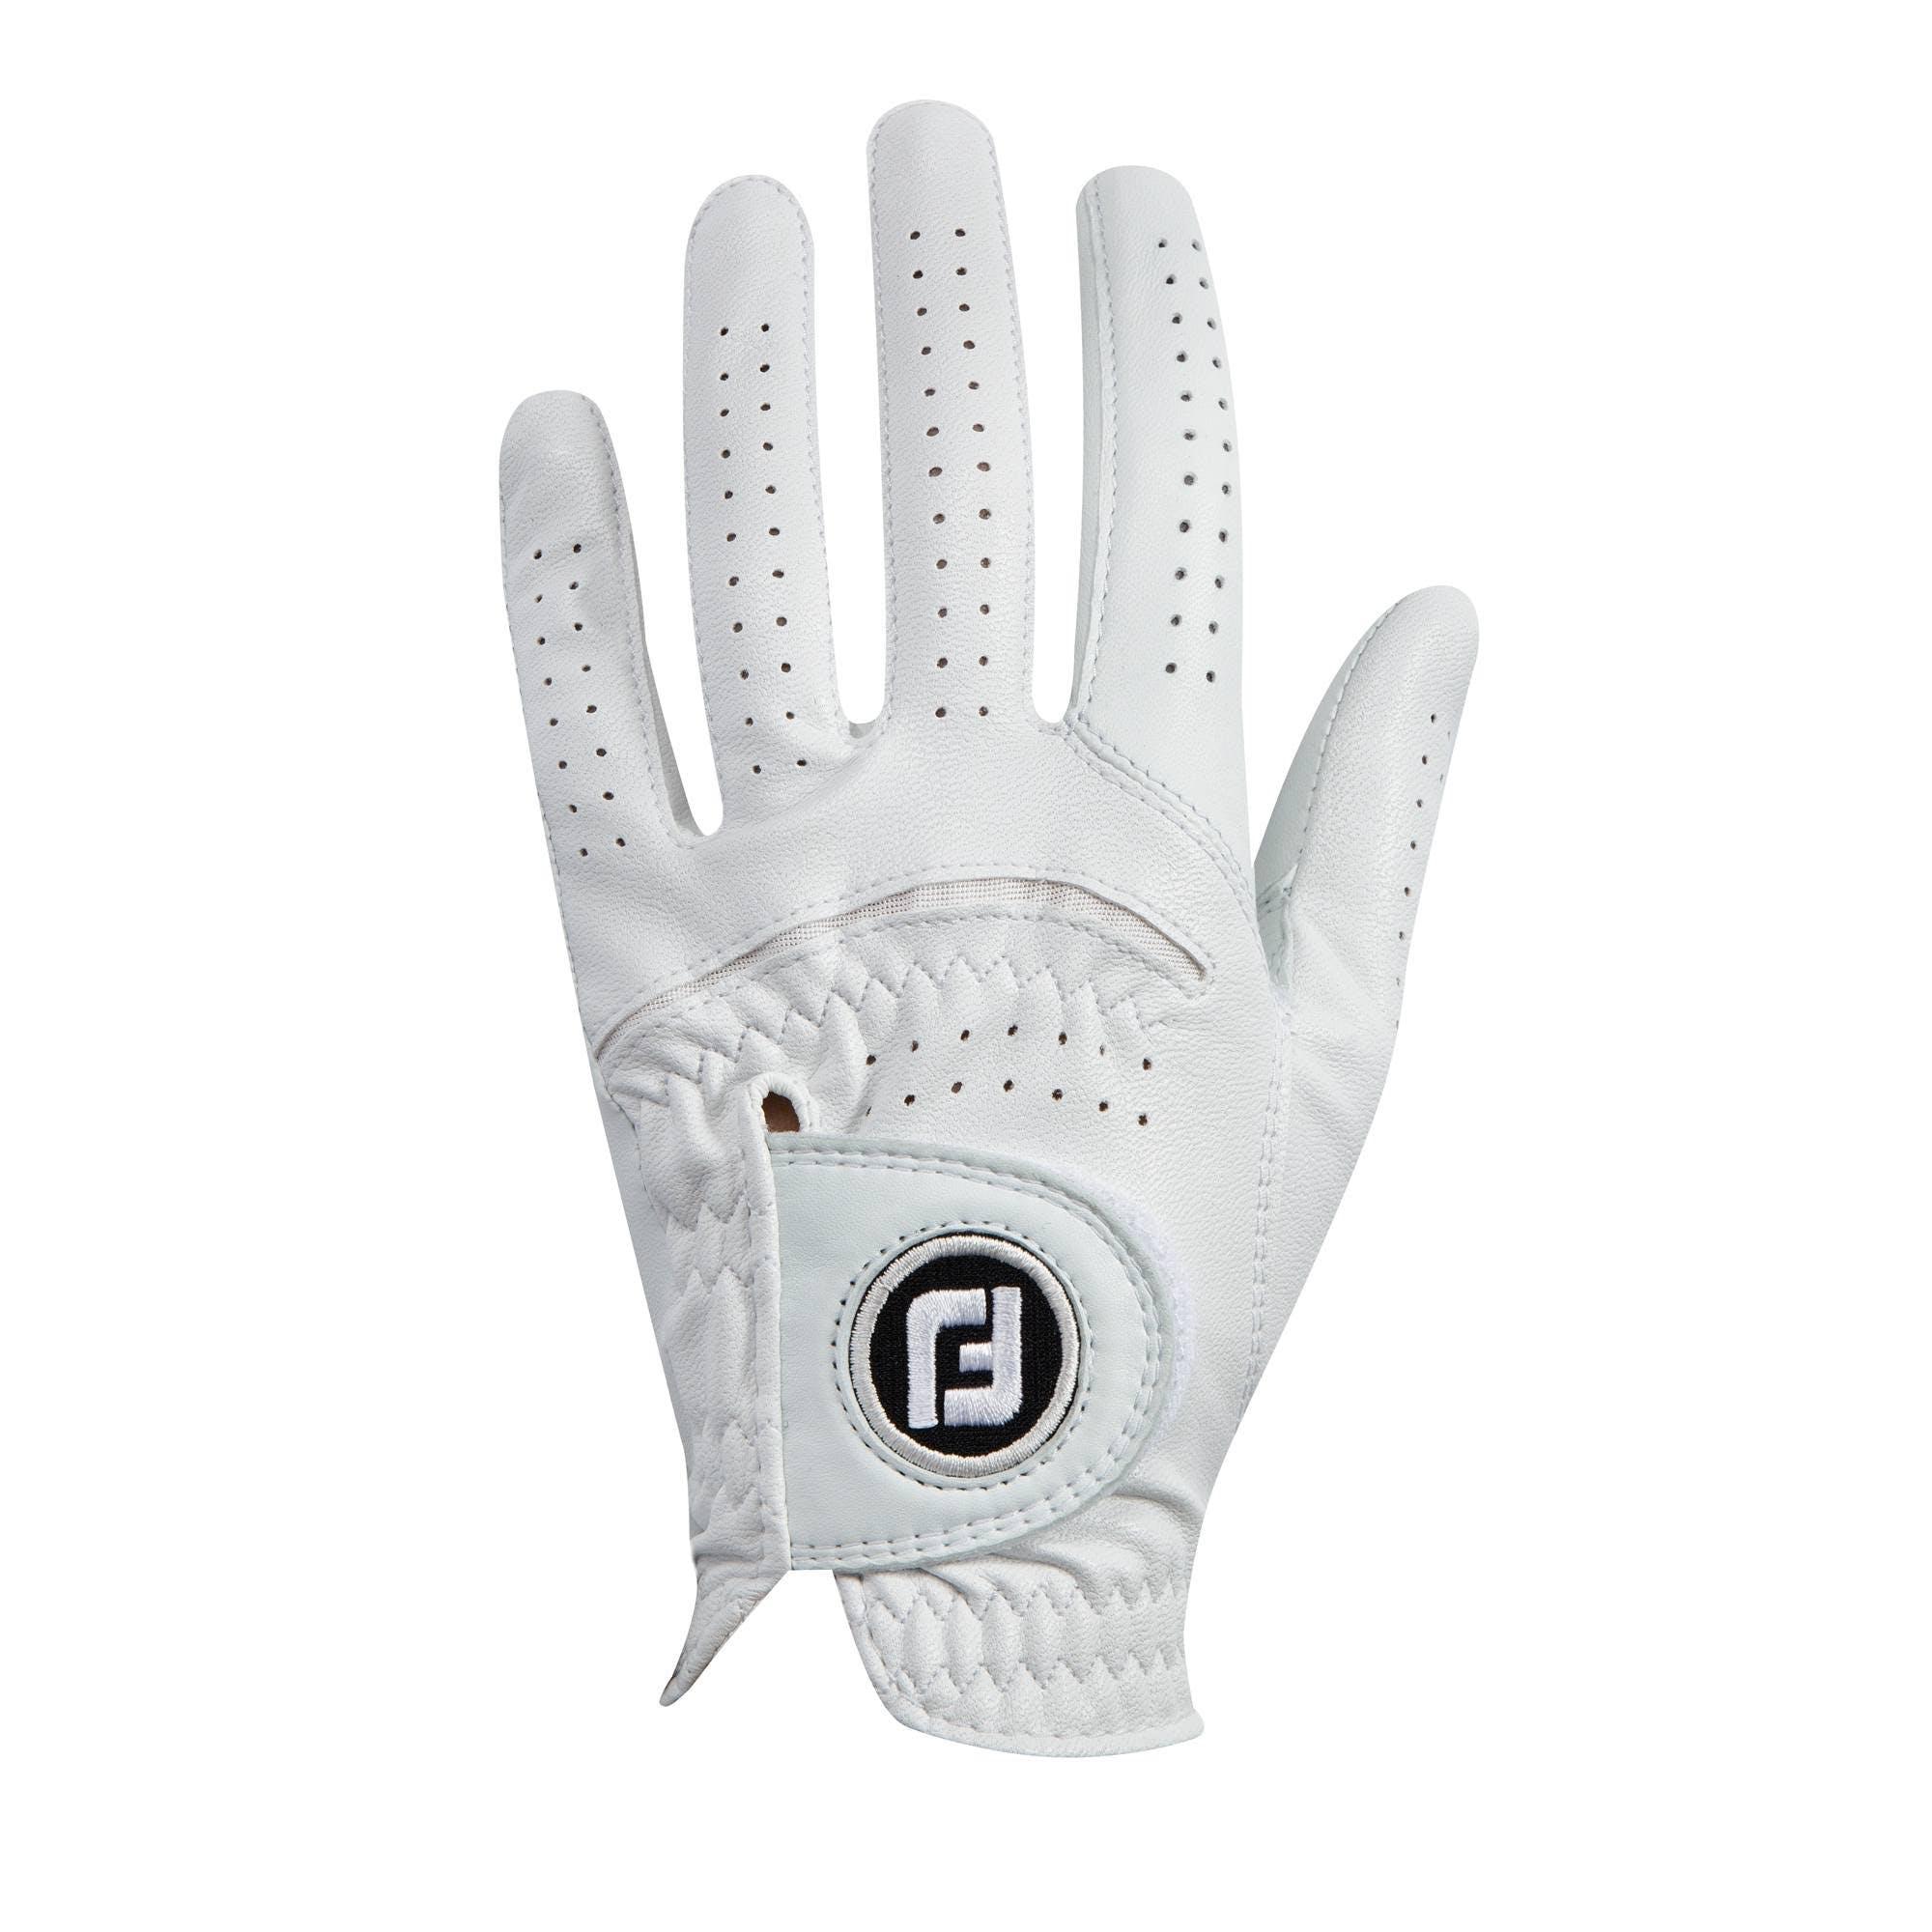 FootJoy Contour FLX Women's Golf Glove